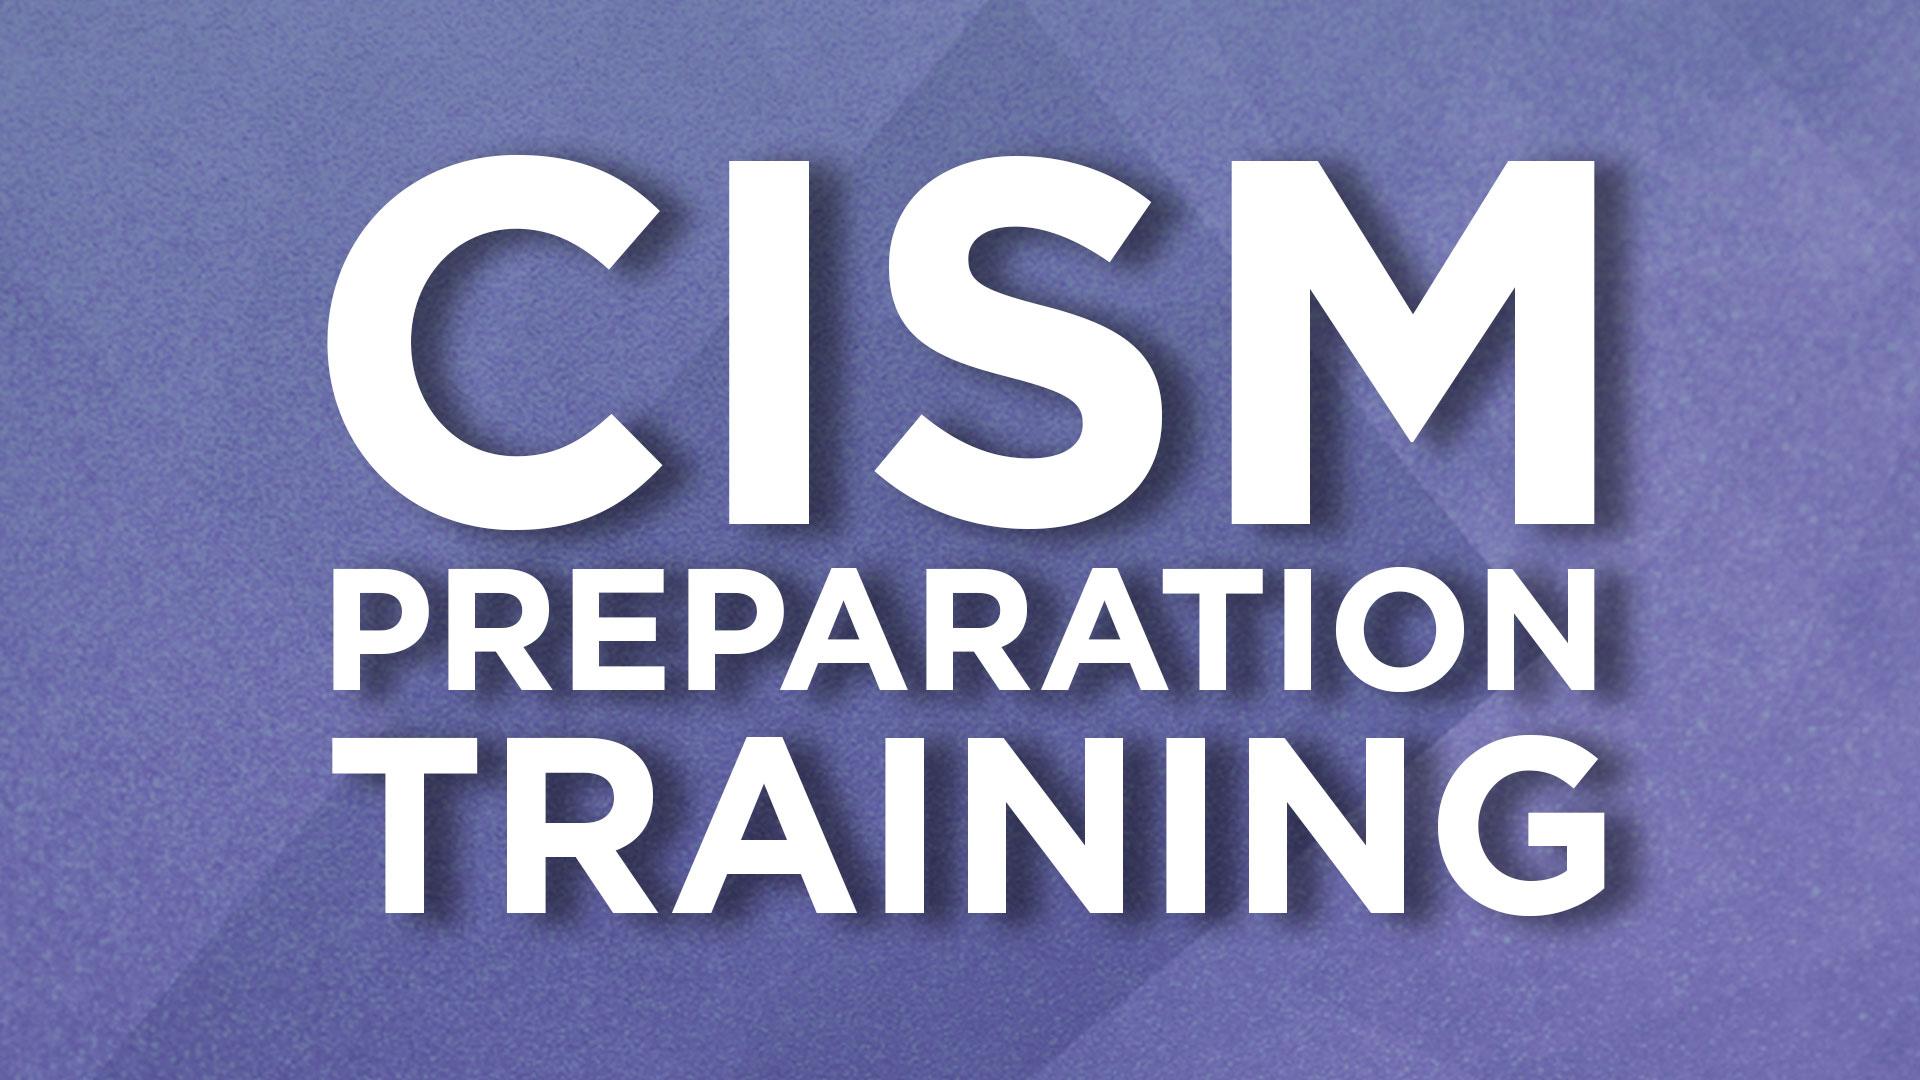 CISM Preparation Training